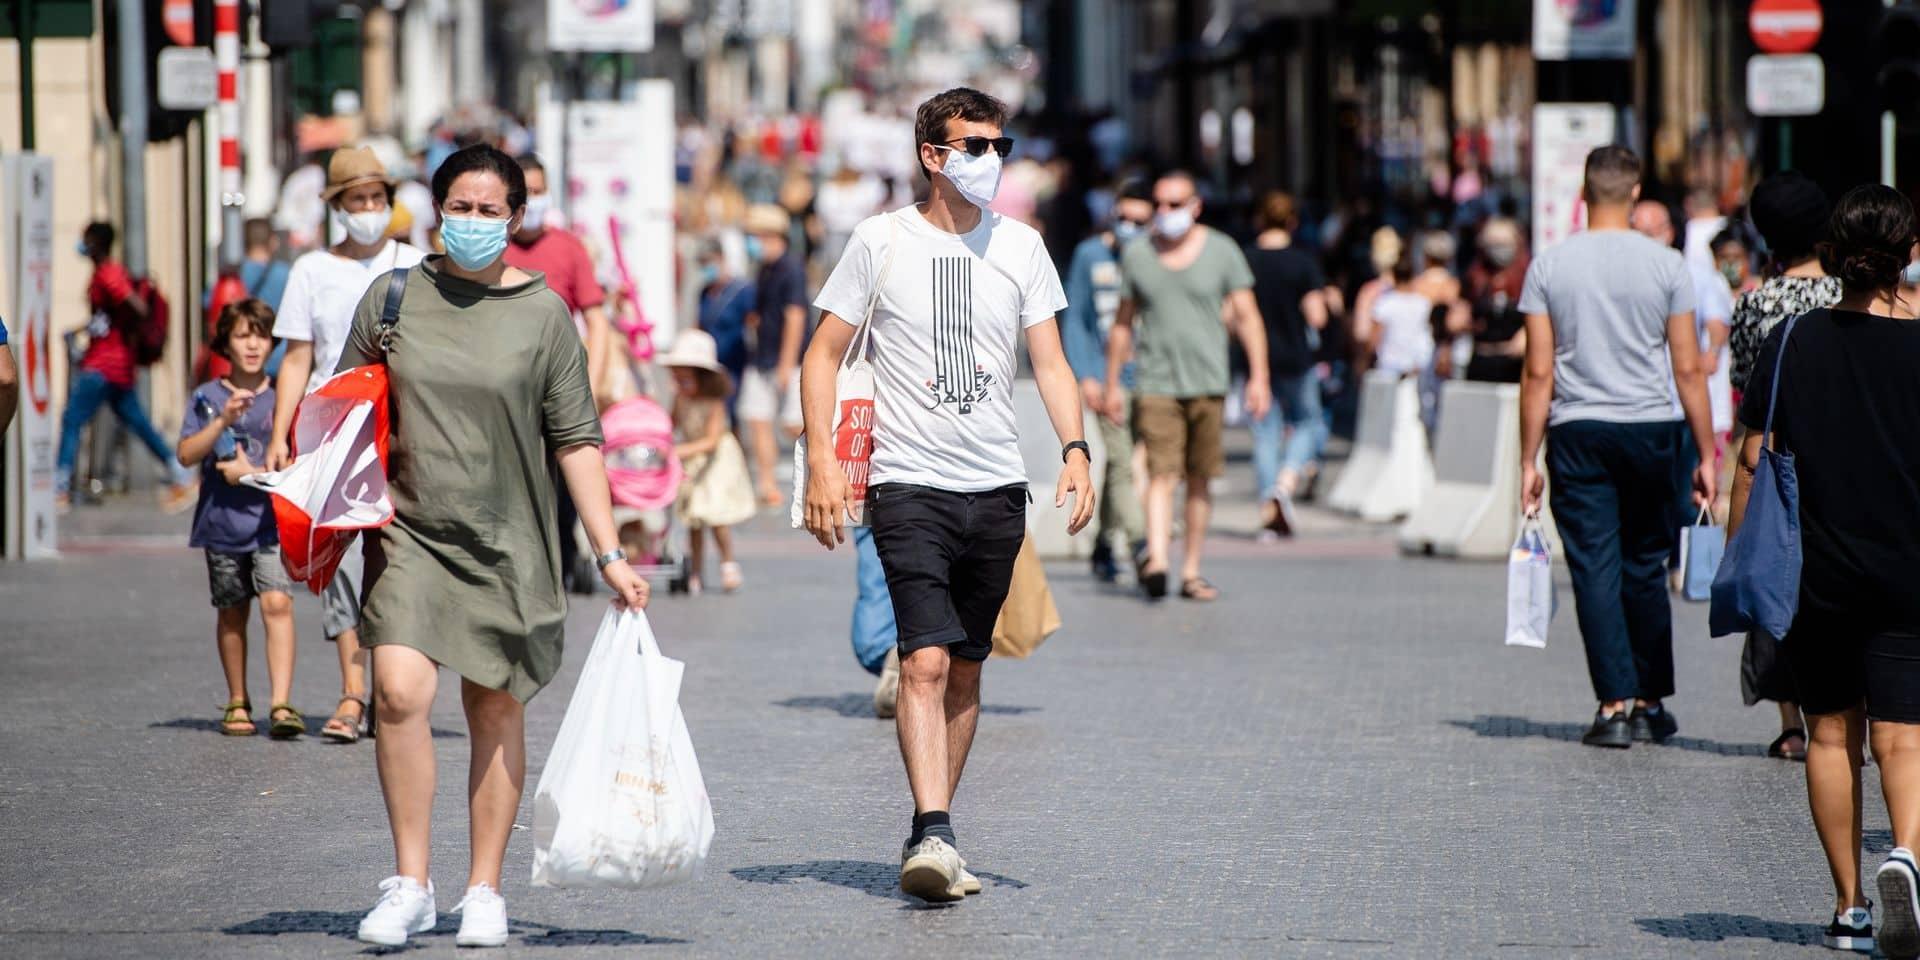 Coronavirus: un comité scientifique se penchera jeudi sur la situation bruxelloise